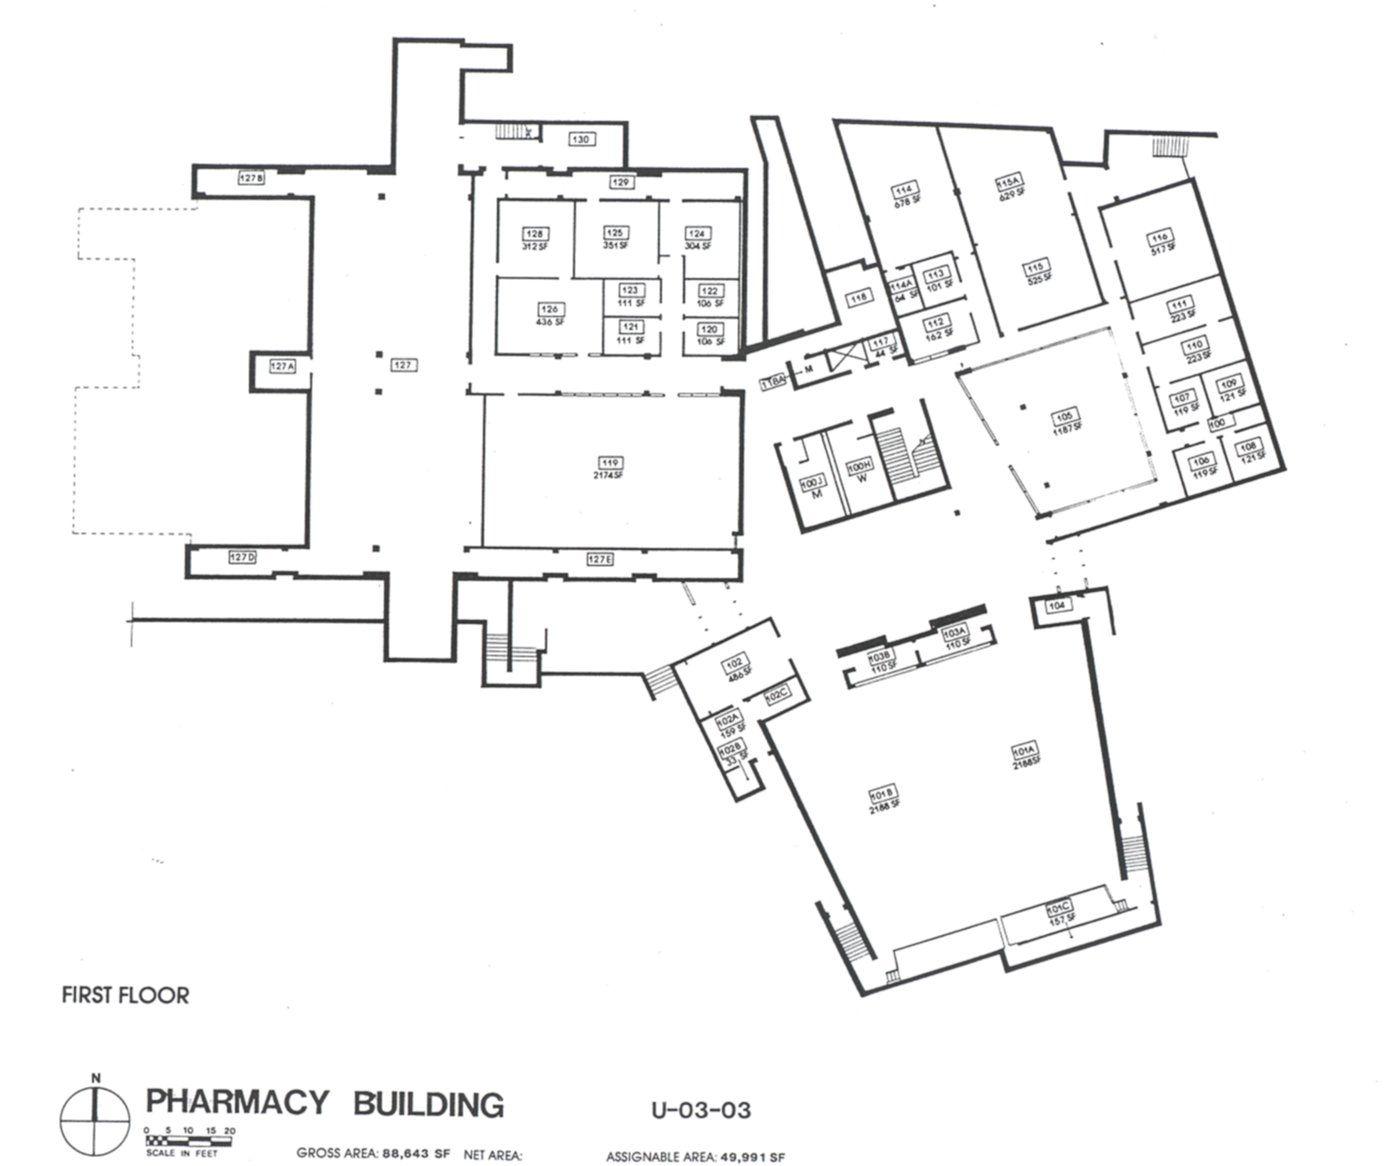 Pin By Lesli Holt On Pharmacy